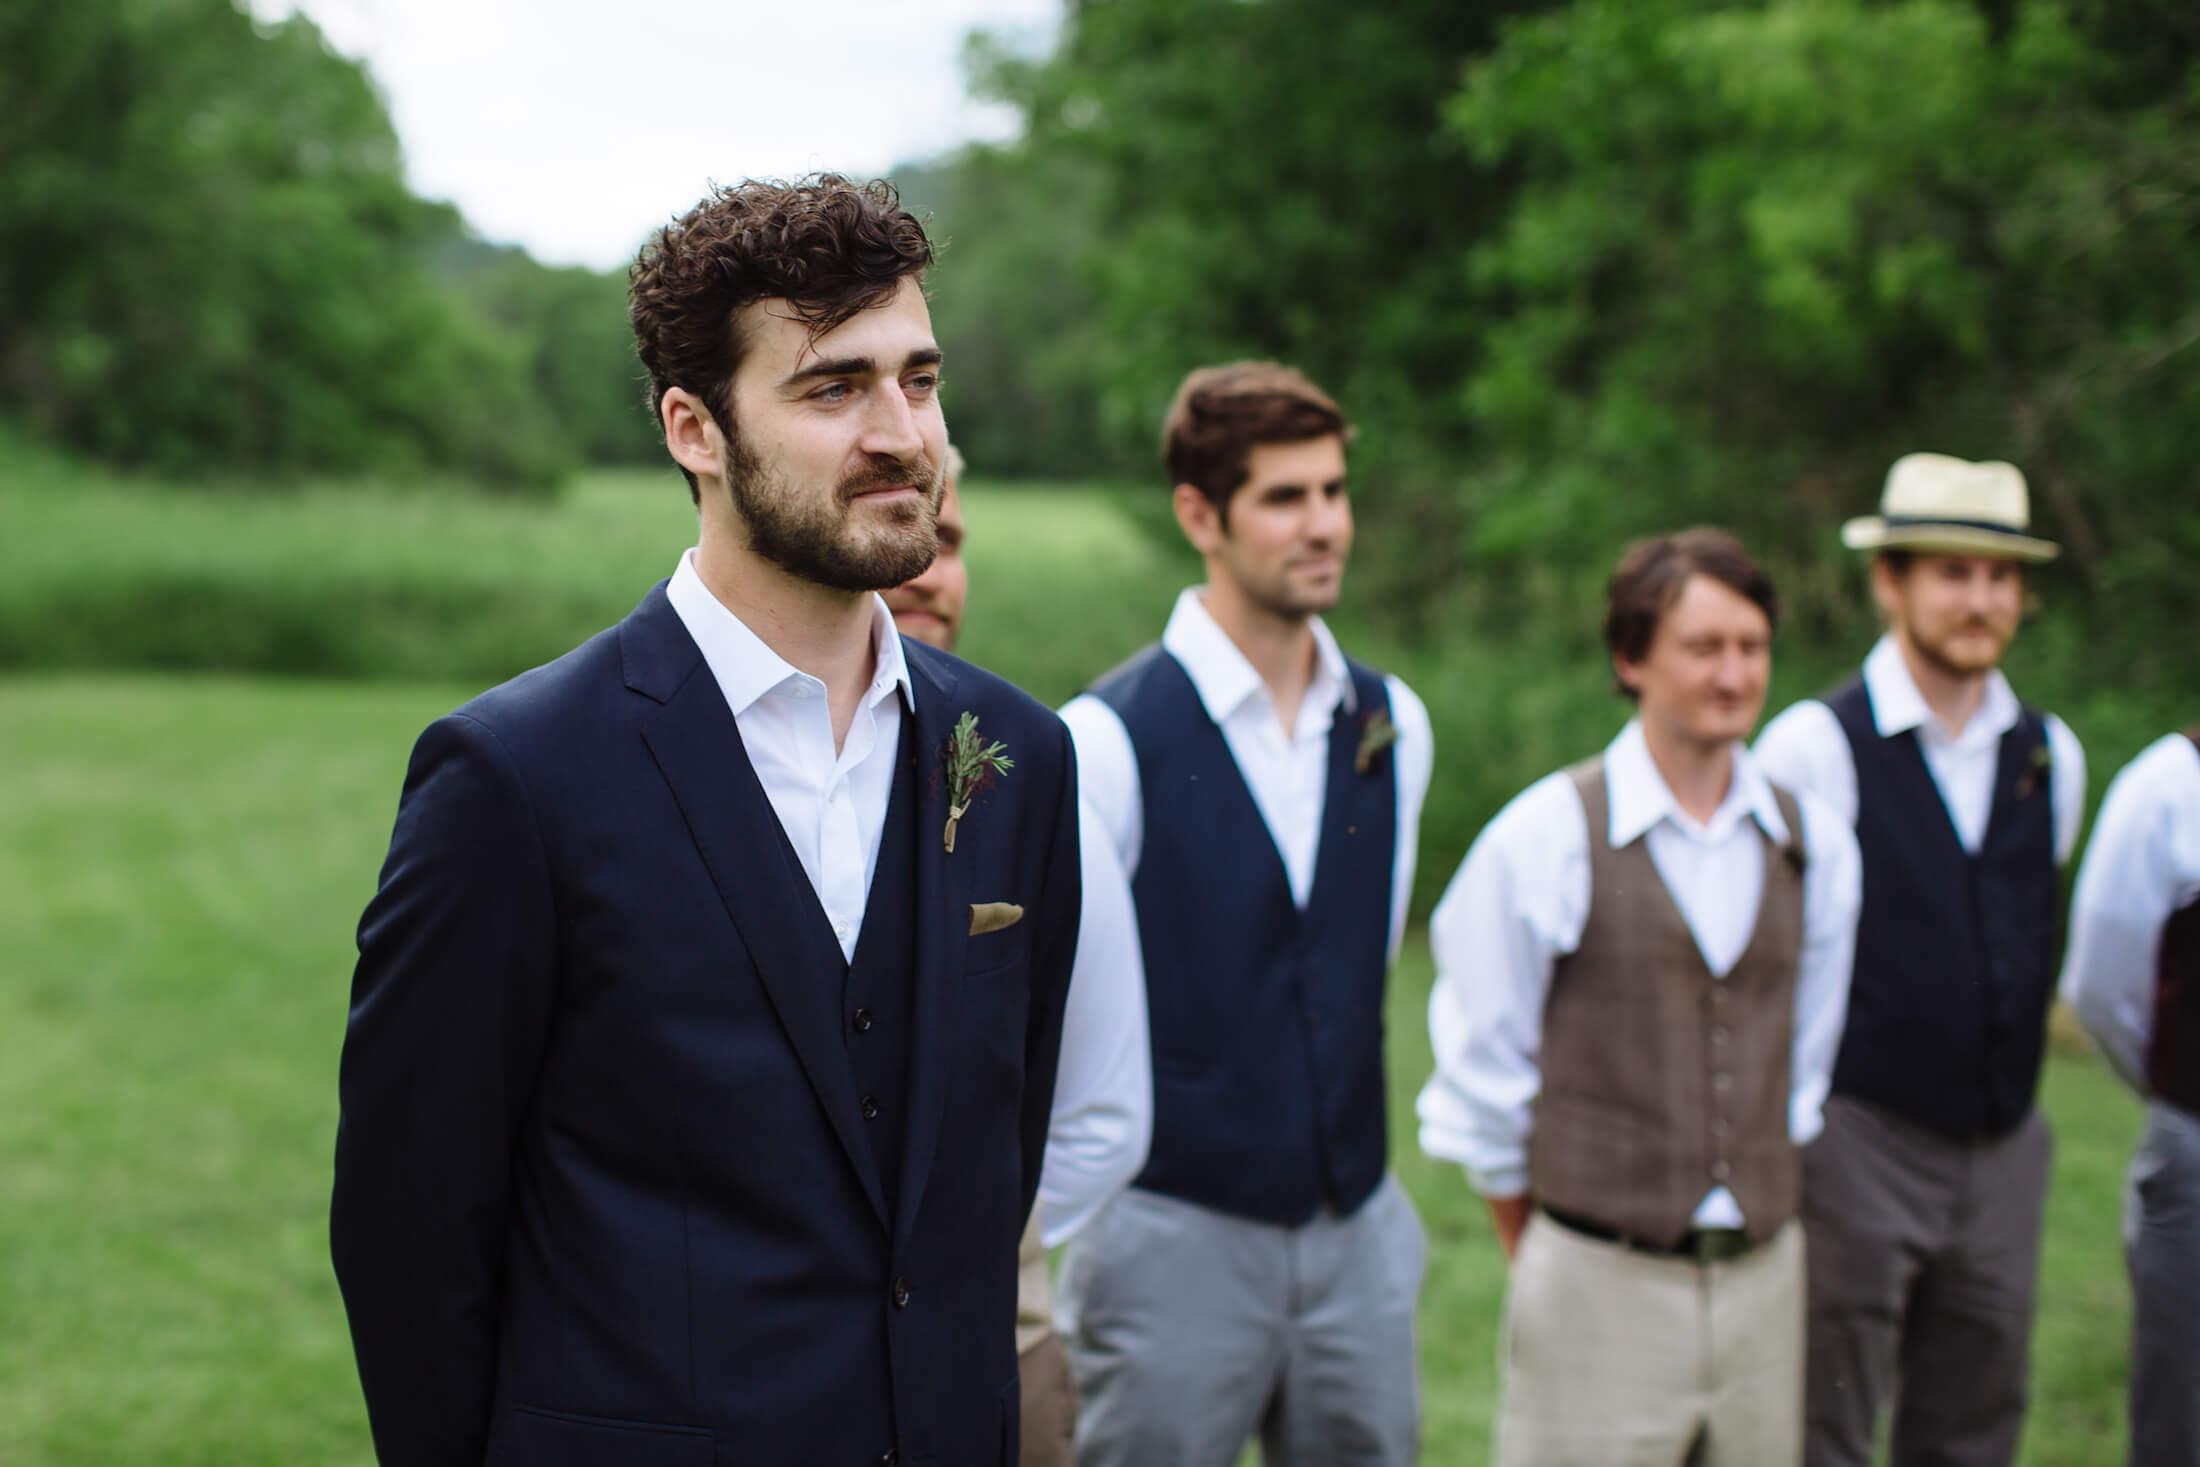 engle-olson-ray-kelly-photography-wisconsin-wedding-62.jpg